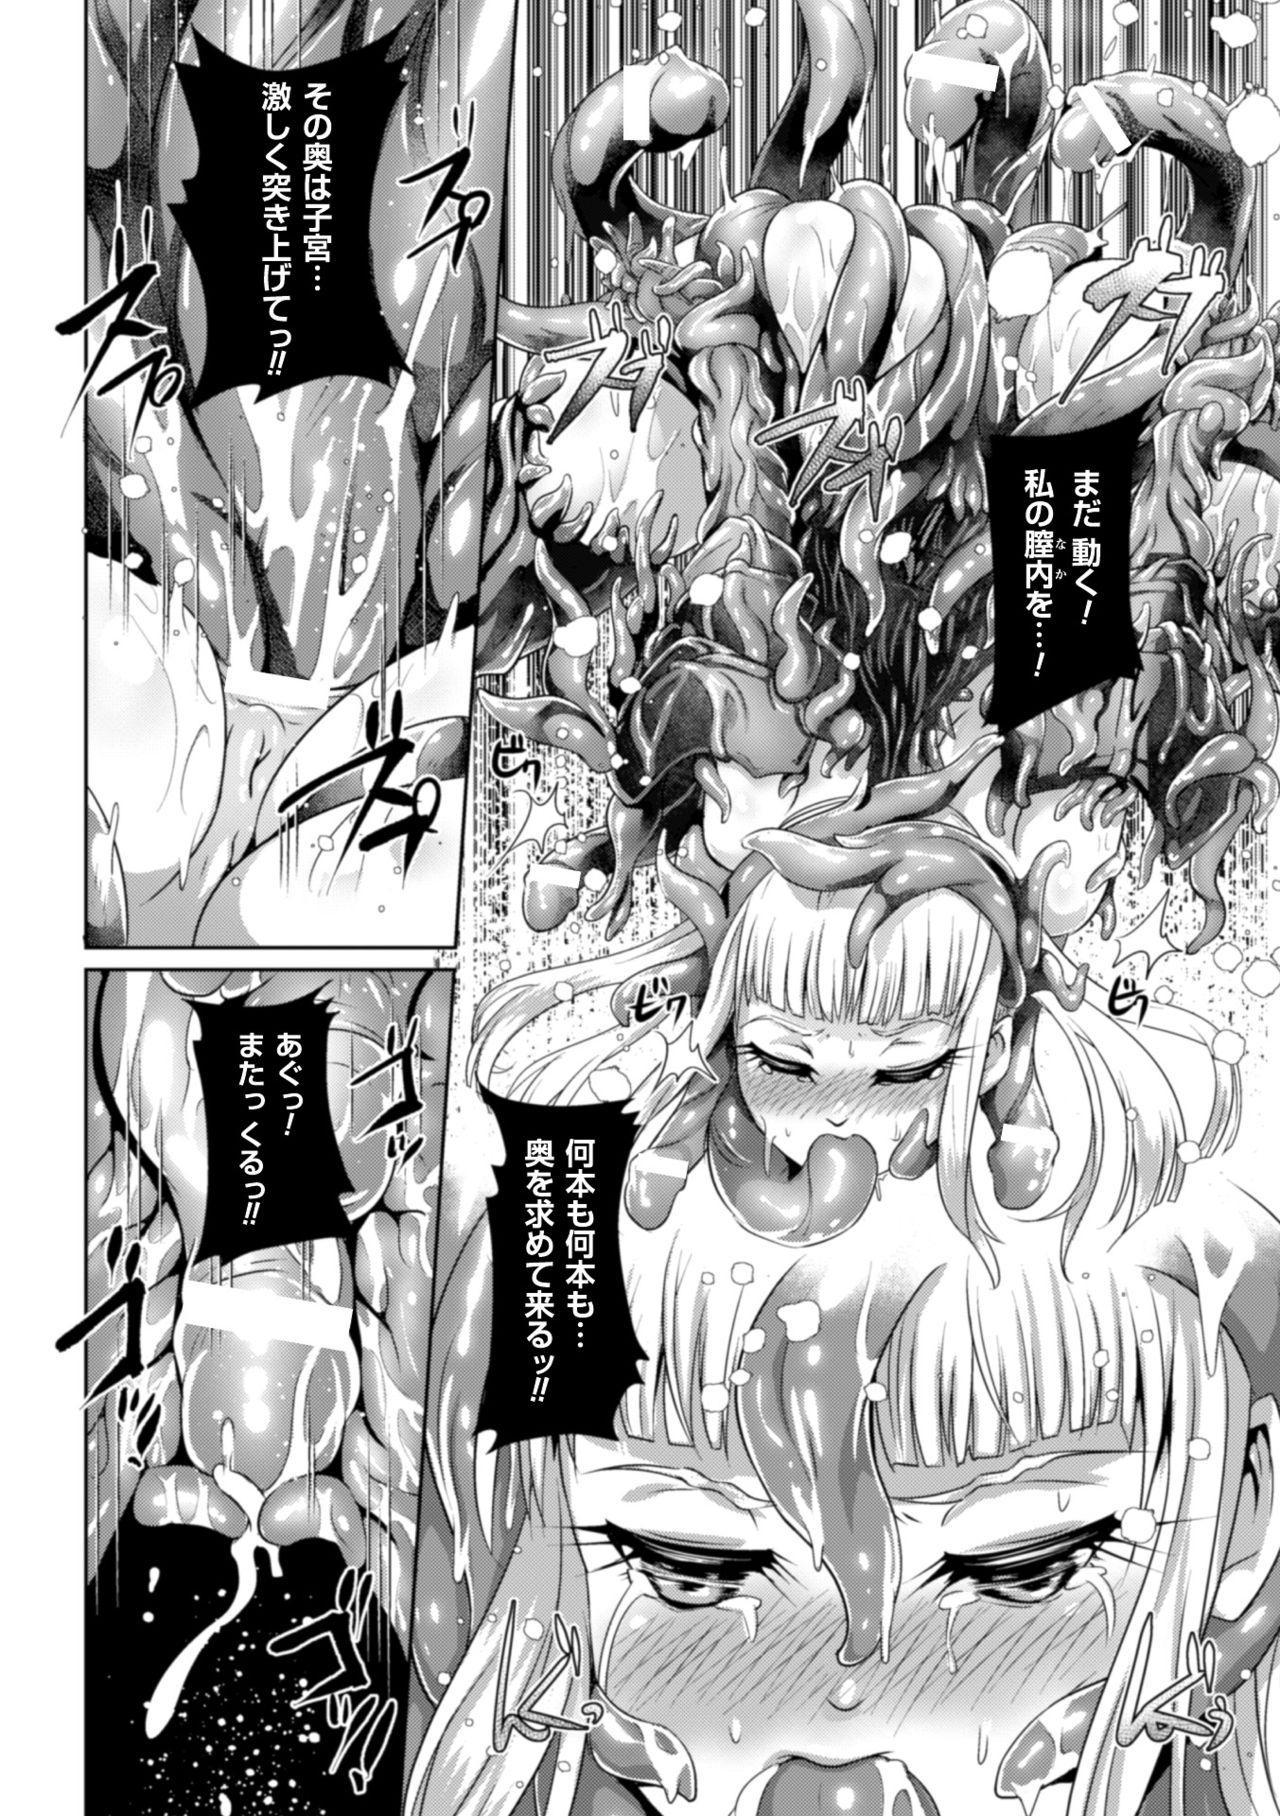 2D Comic Magazine Shokushu Yoroi ni Zenshin o Okasare Mugen Zecchou! Vol. 5 19